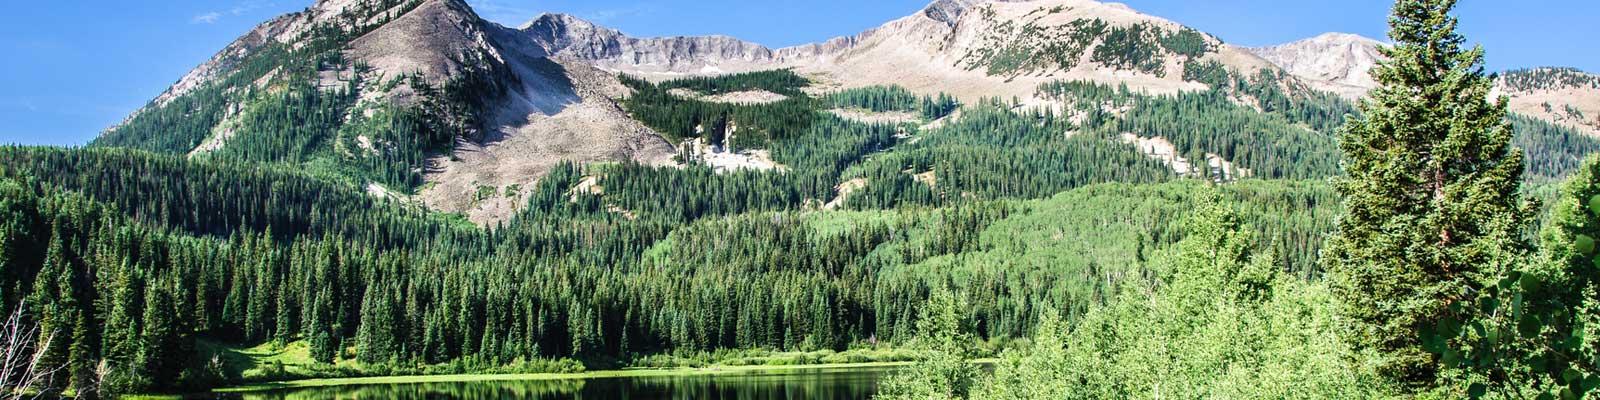 As Grandes Montanhas dos Estados Unidos  Comprar, Vender, Alugar, Casas, Apartamentos, Residencias.